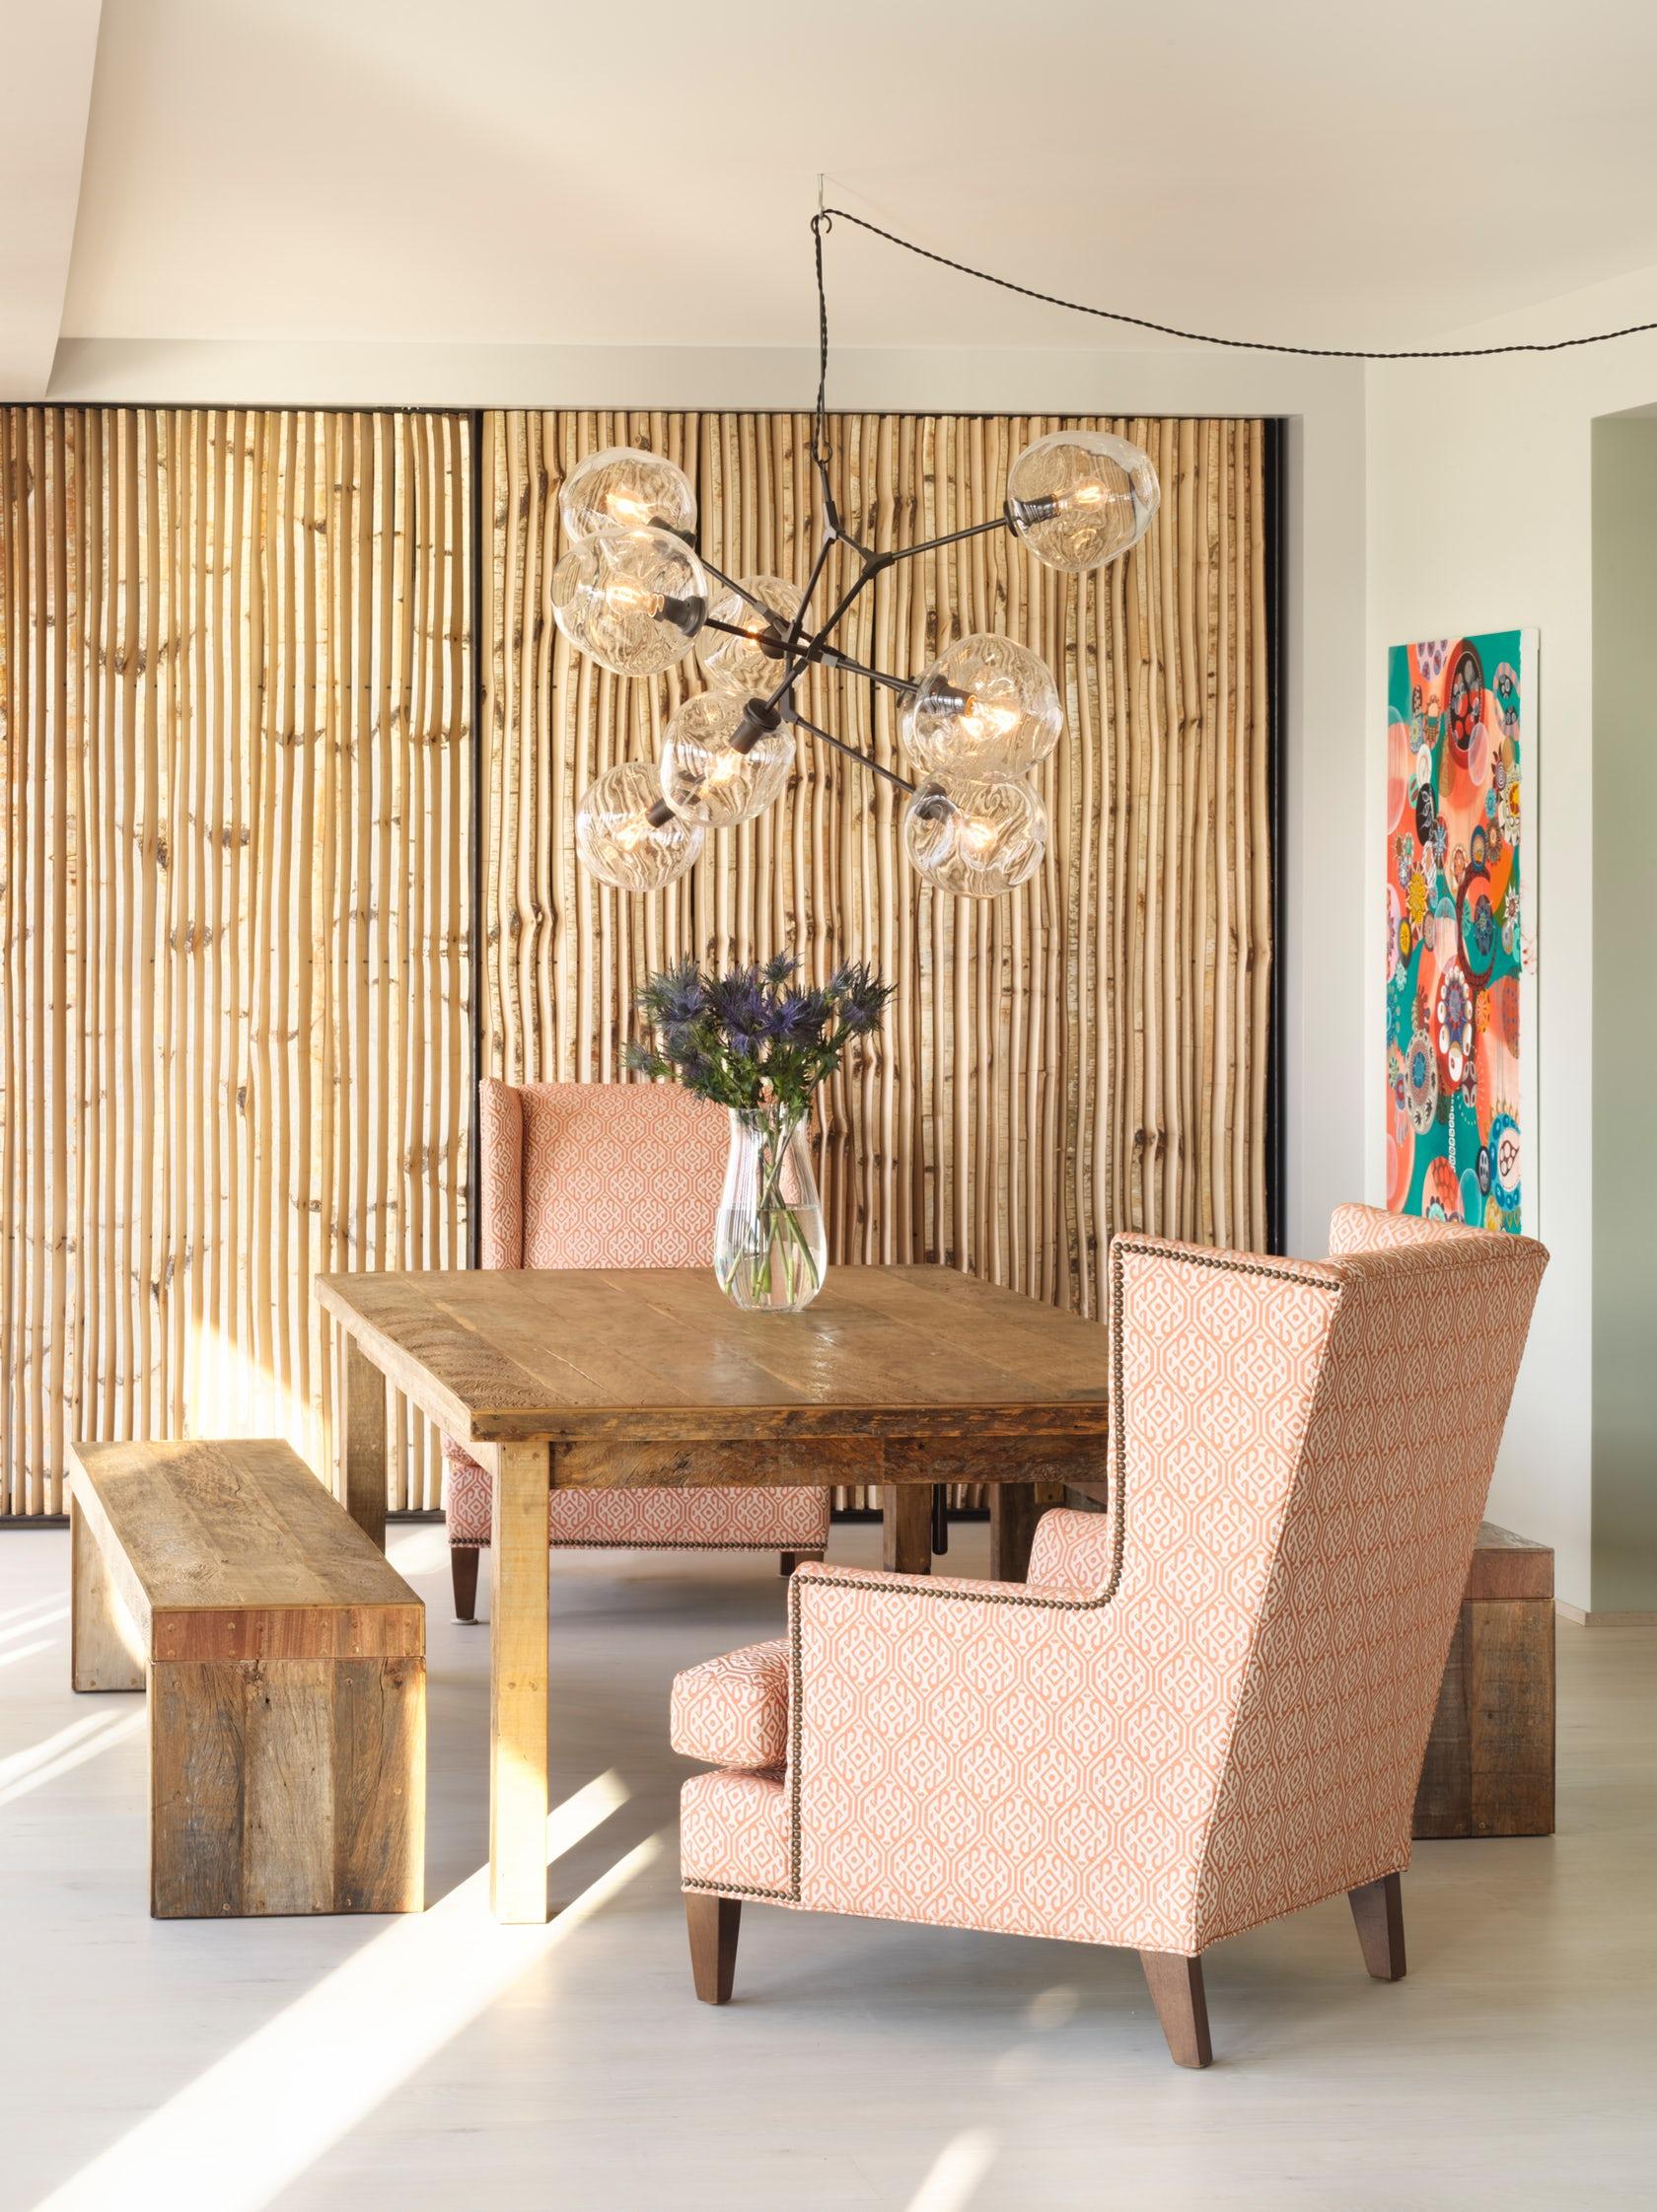 Бамбуковые обои в интерьере модерн